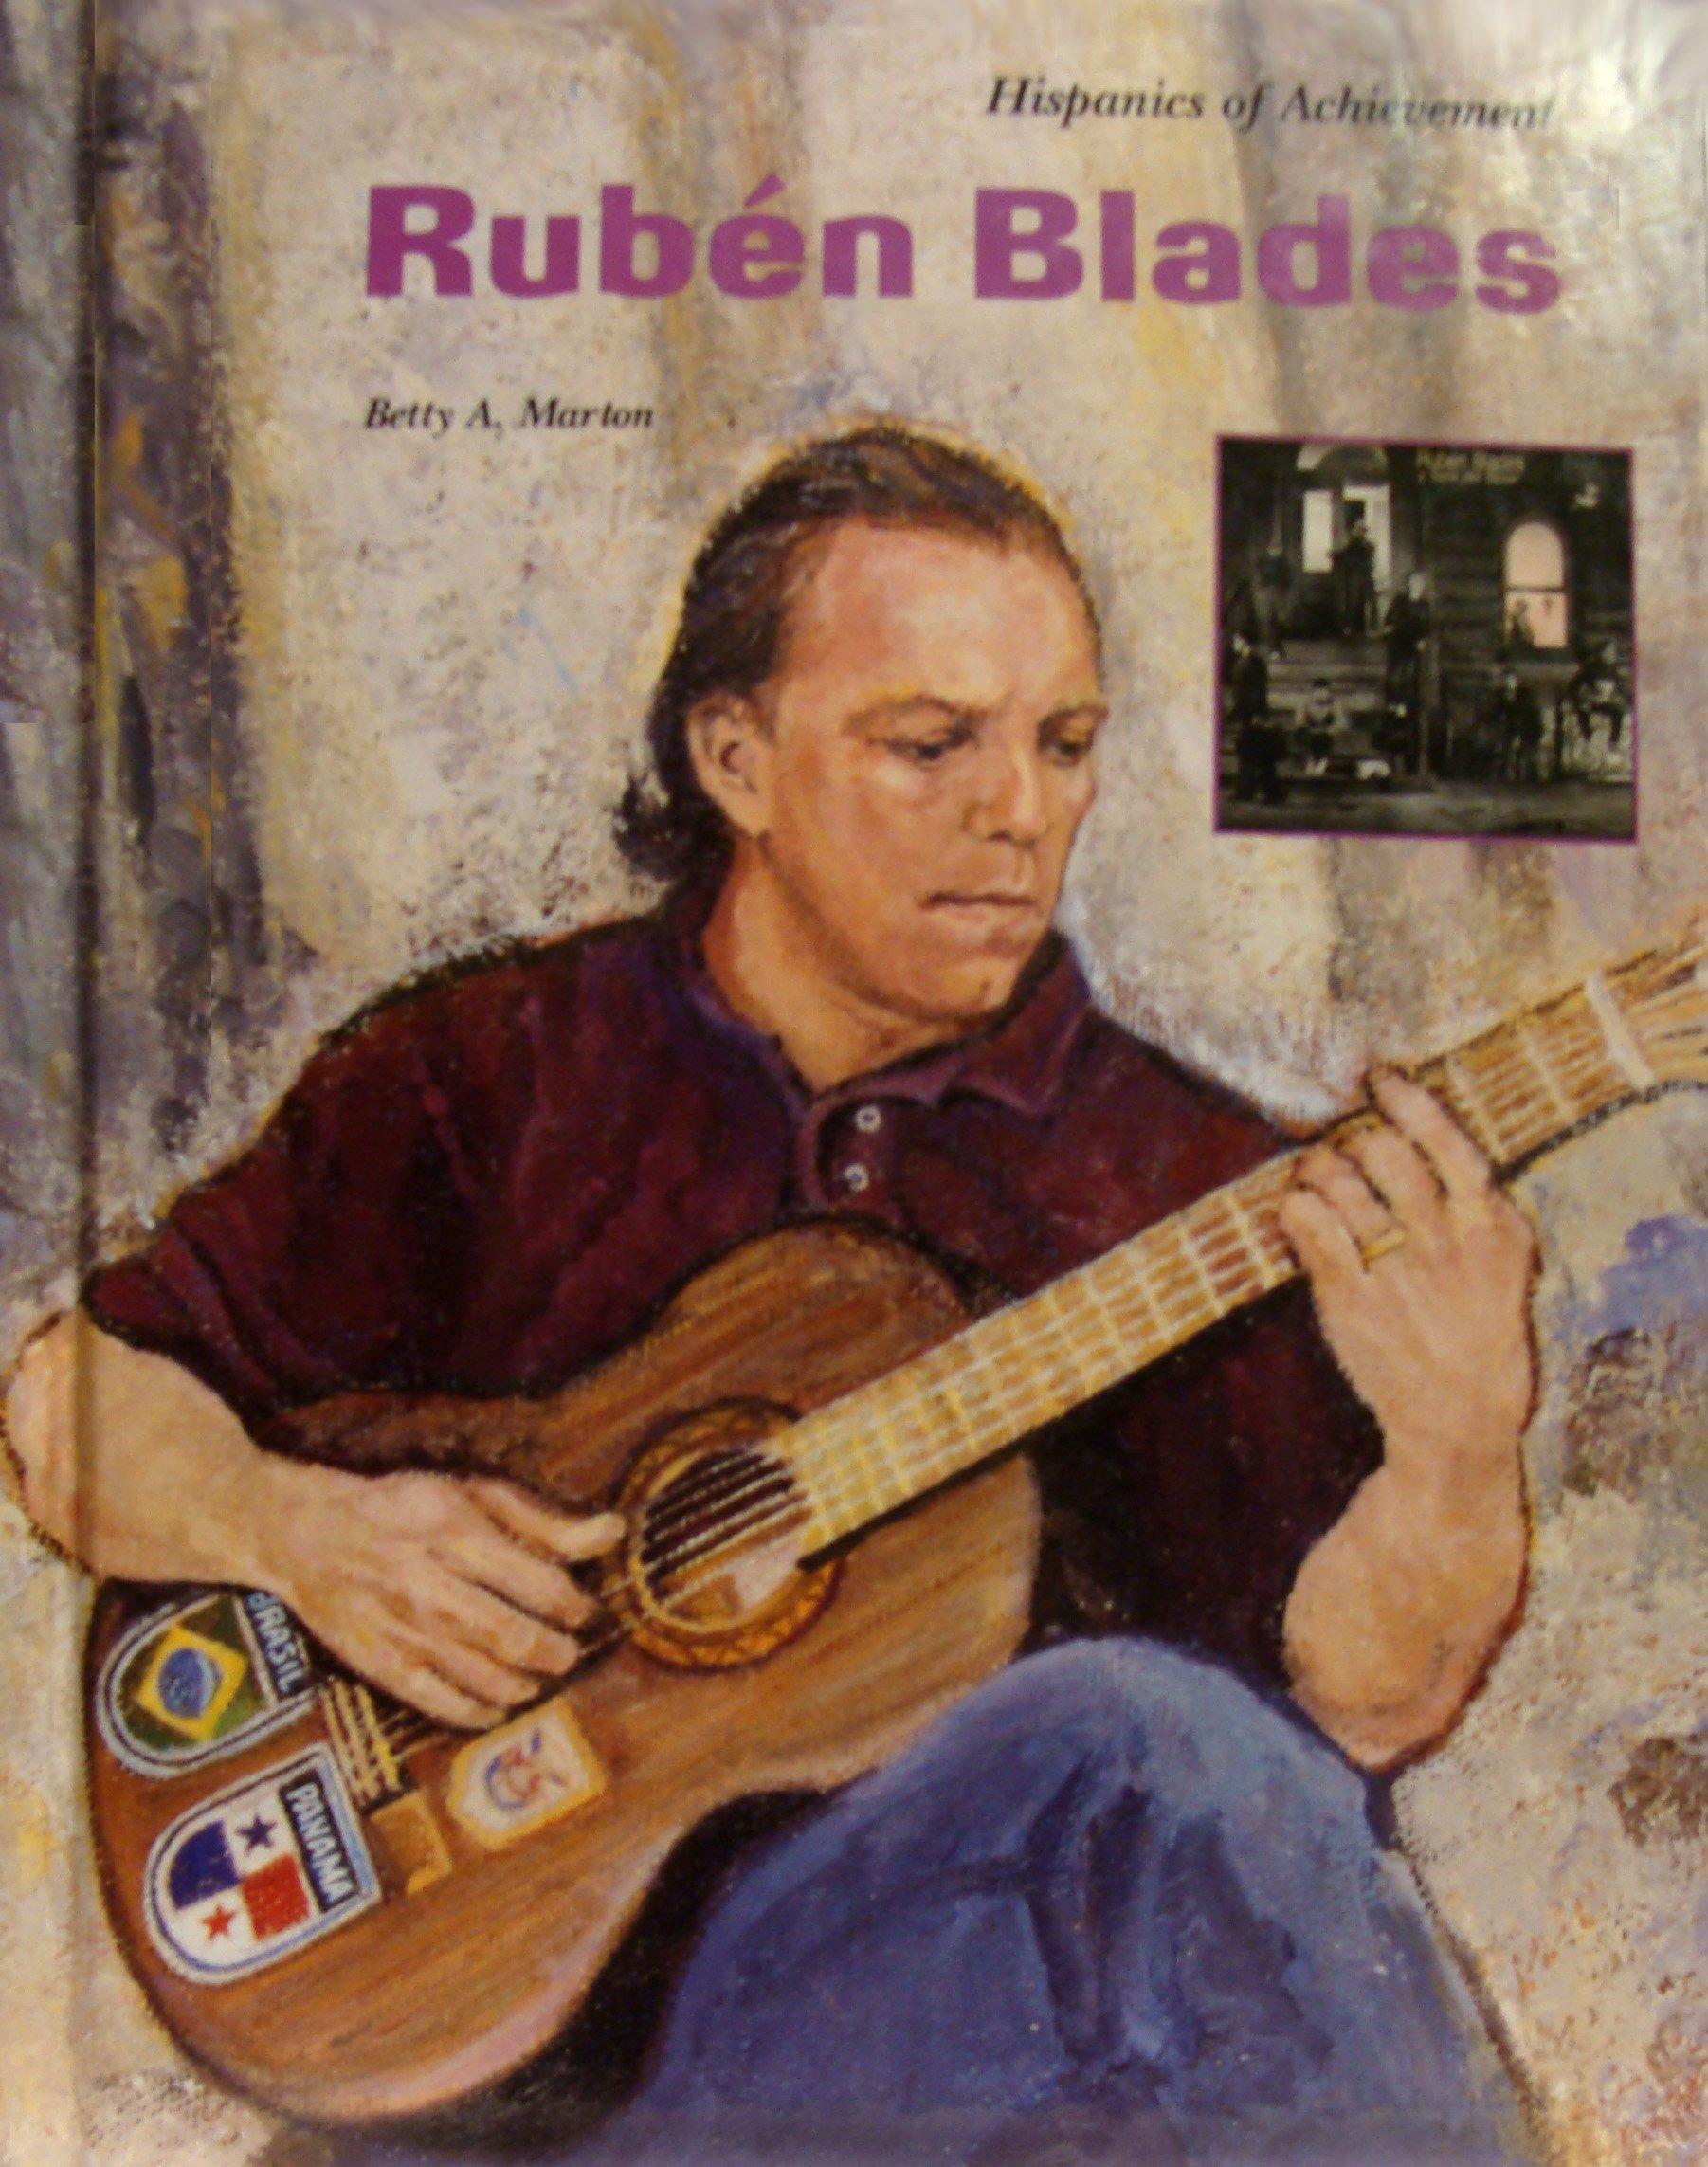 Ruben Blades (Hispanics of Achievement Series)